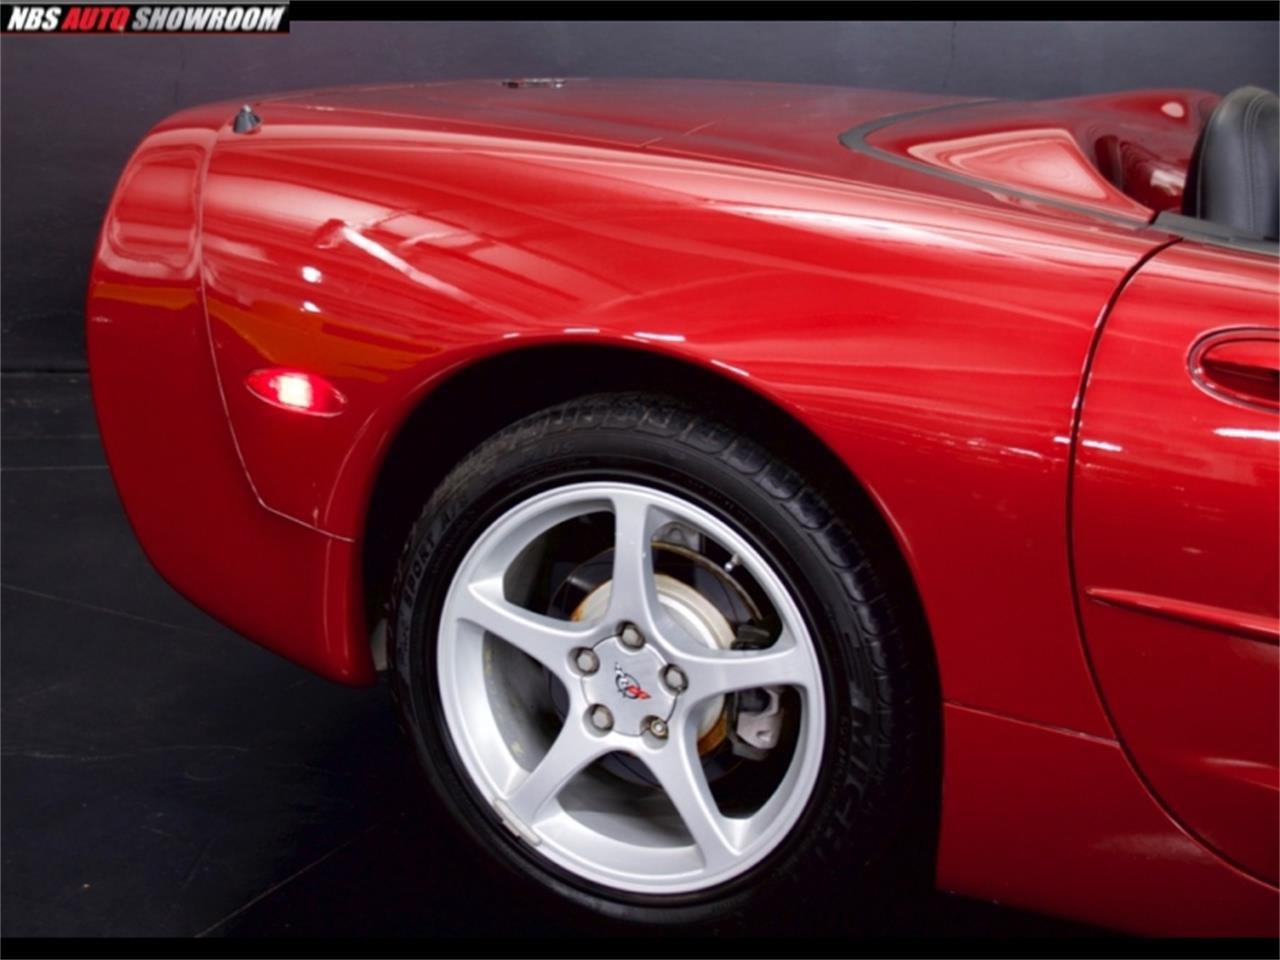 2001 Chevrolet Corvette (CC-1265309) for sale in Milpitas, California